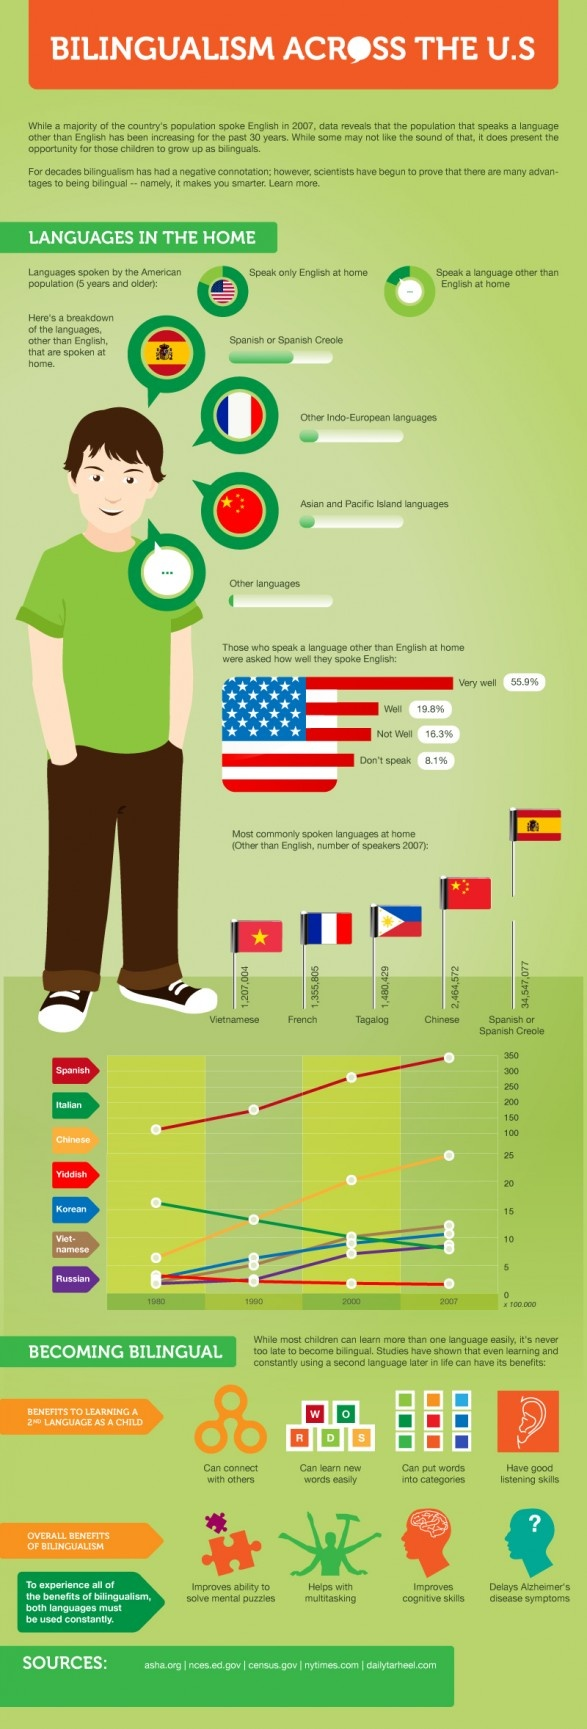 esl.com - Learn English in the USA - Learn English